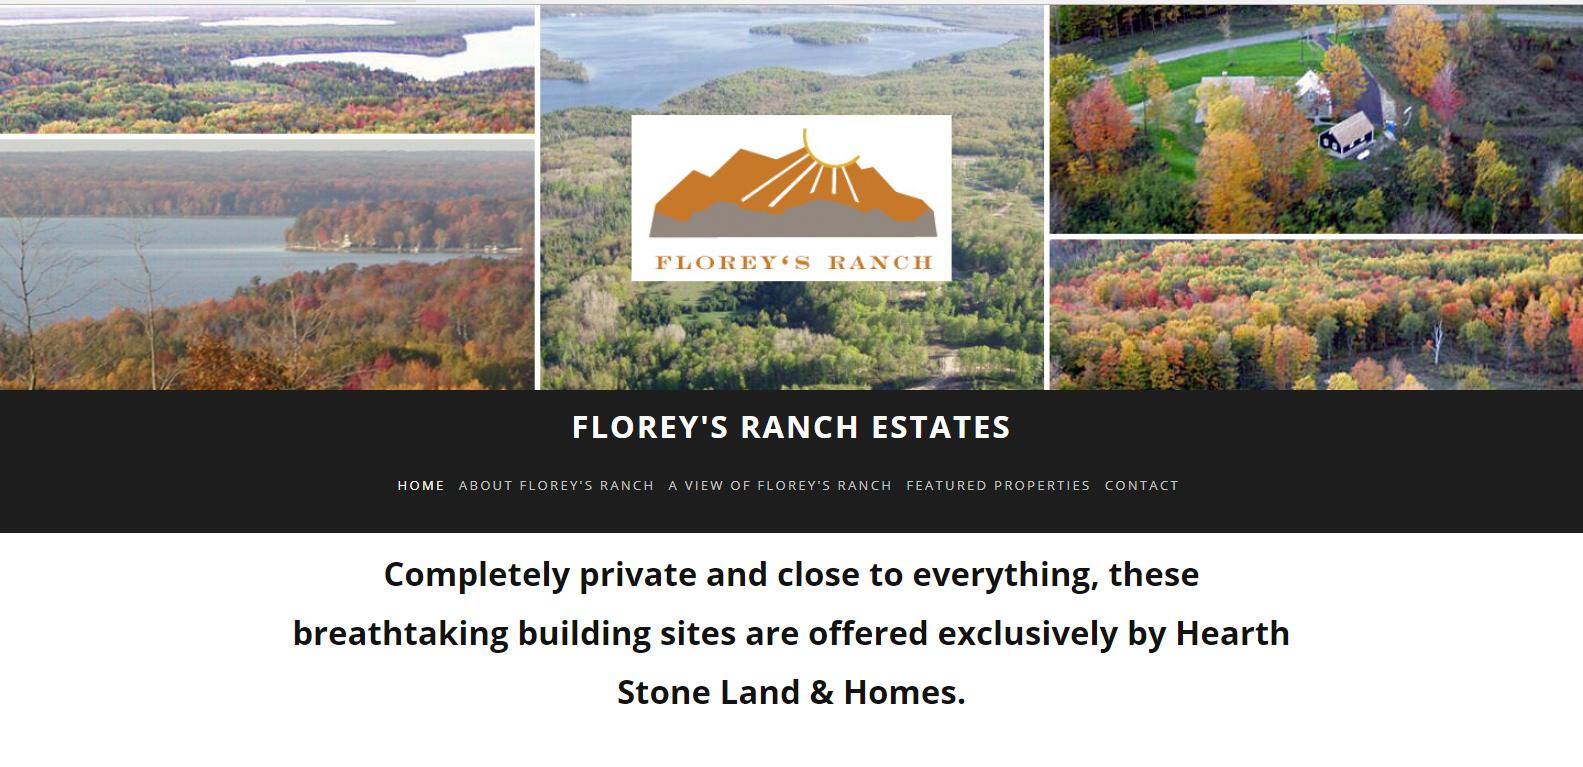 floreys-ranch-website.jpg